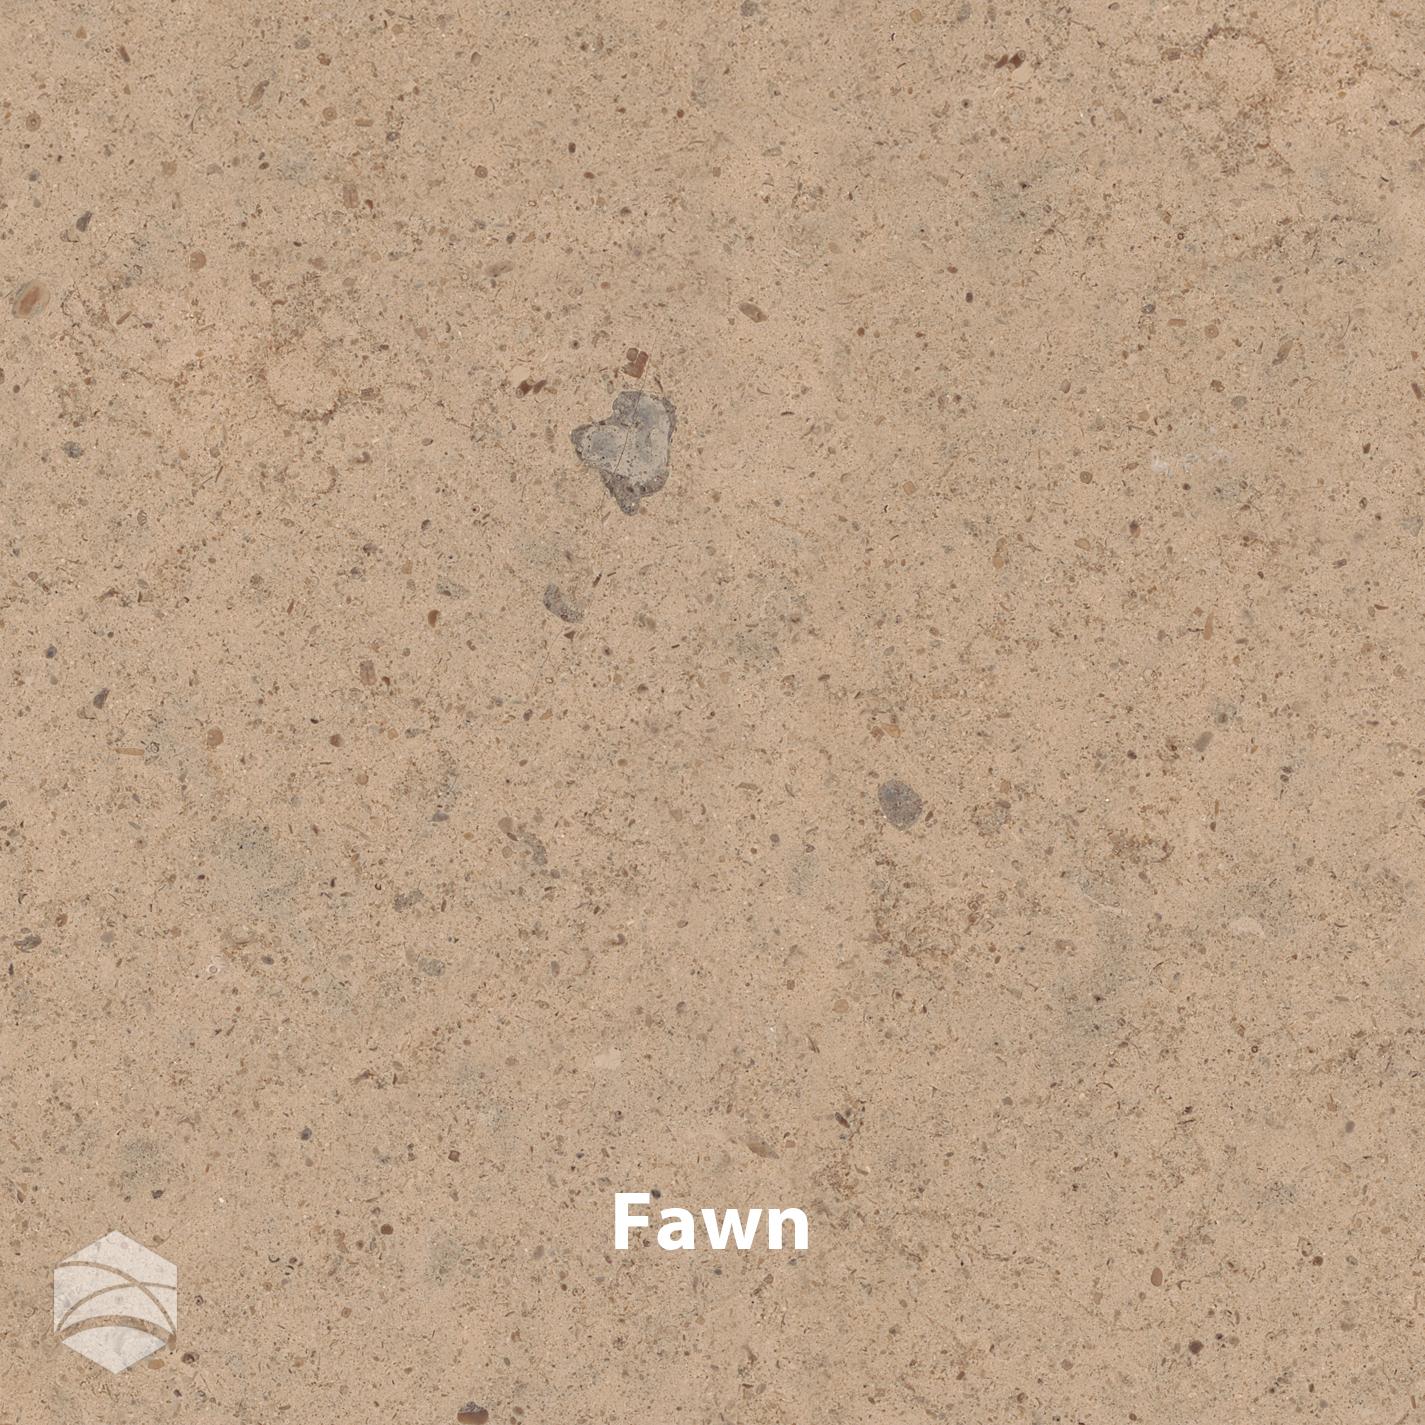 Fawn_V2_14x14.jpg